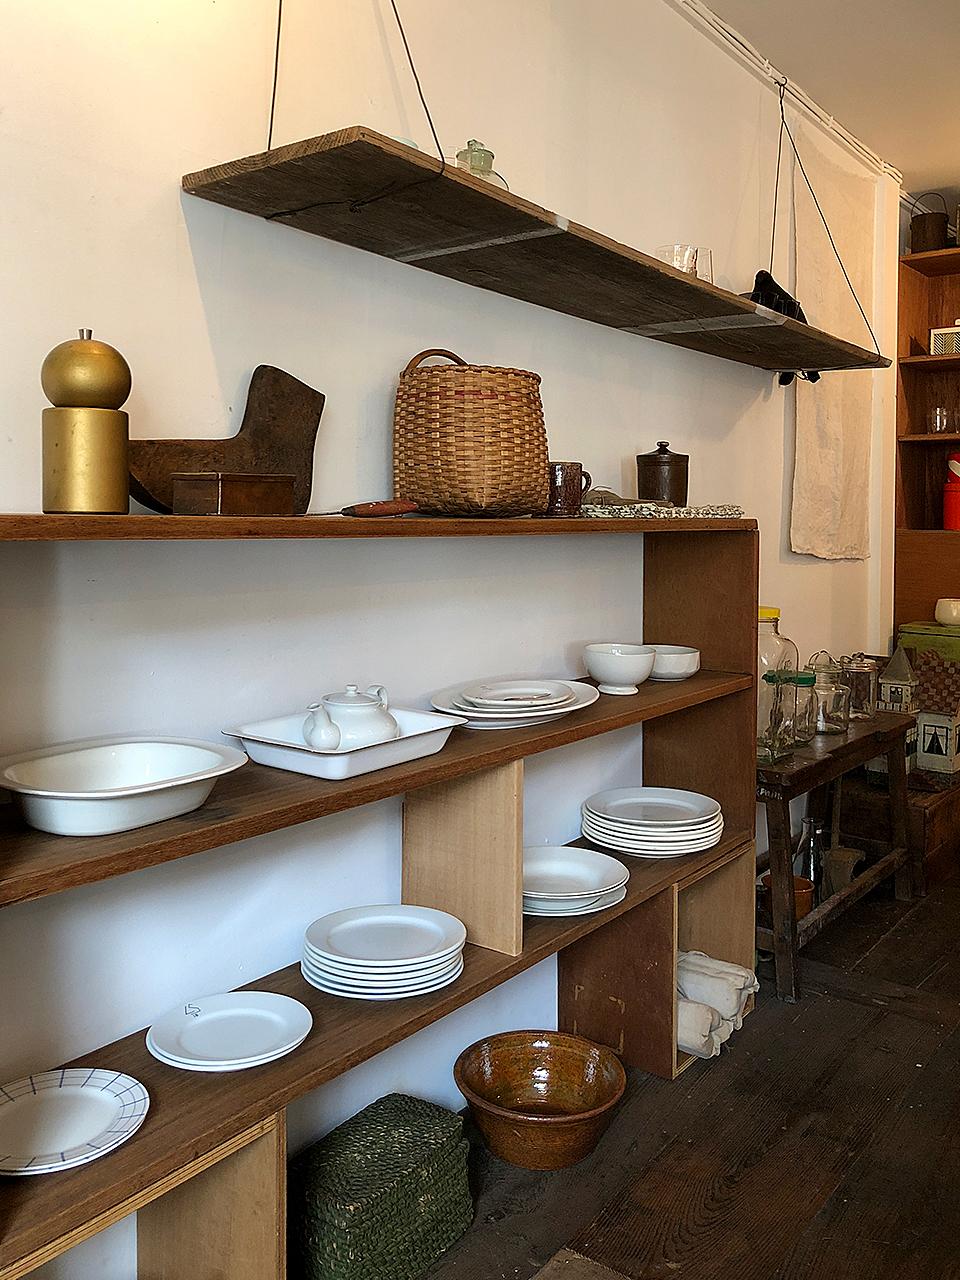 Soil 店内の棚に並ぶオールドアラビアの食器